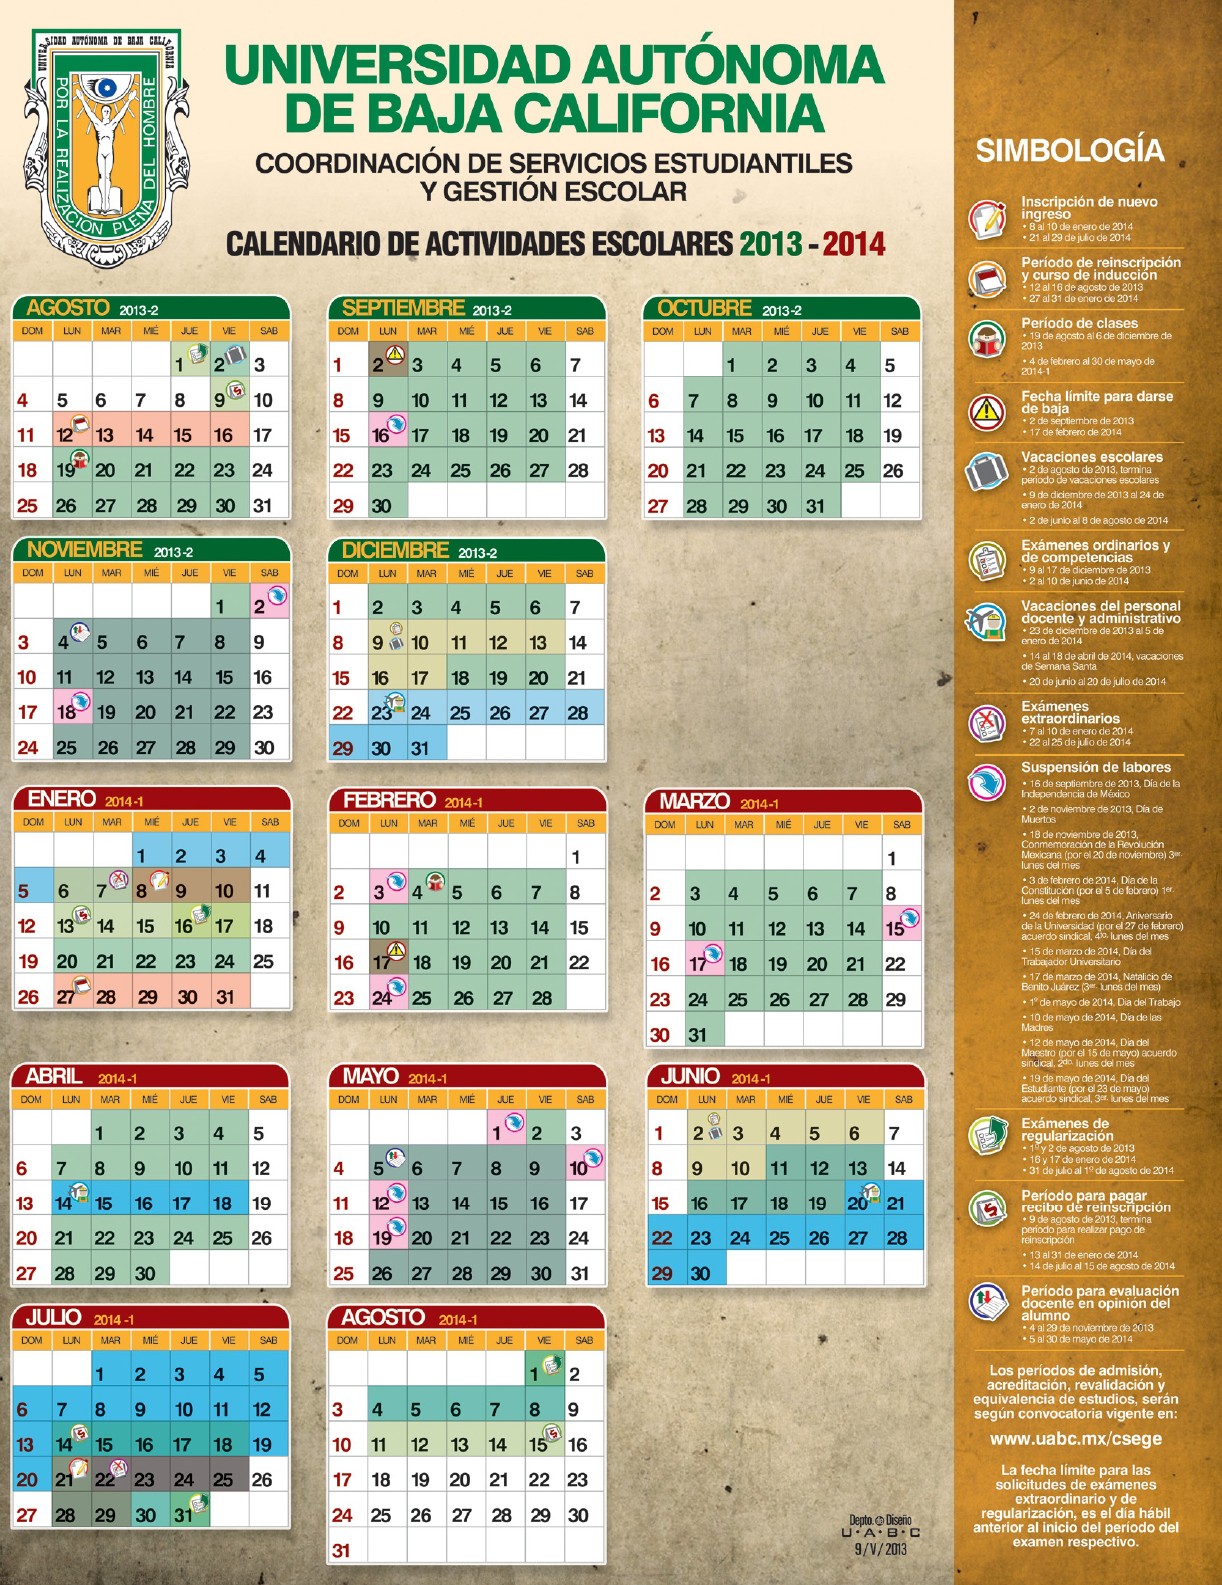 calendario escolar uabc 2013-2014